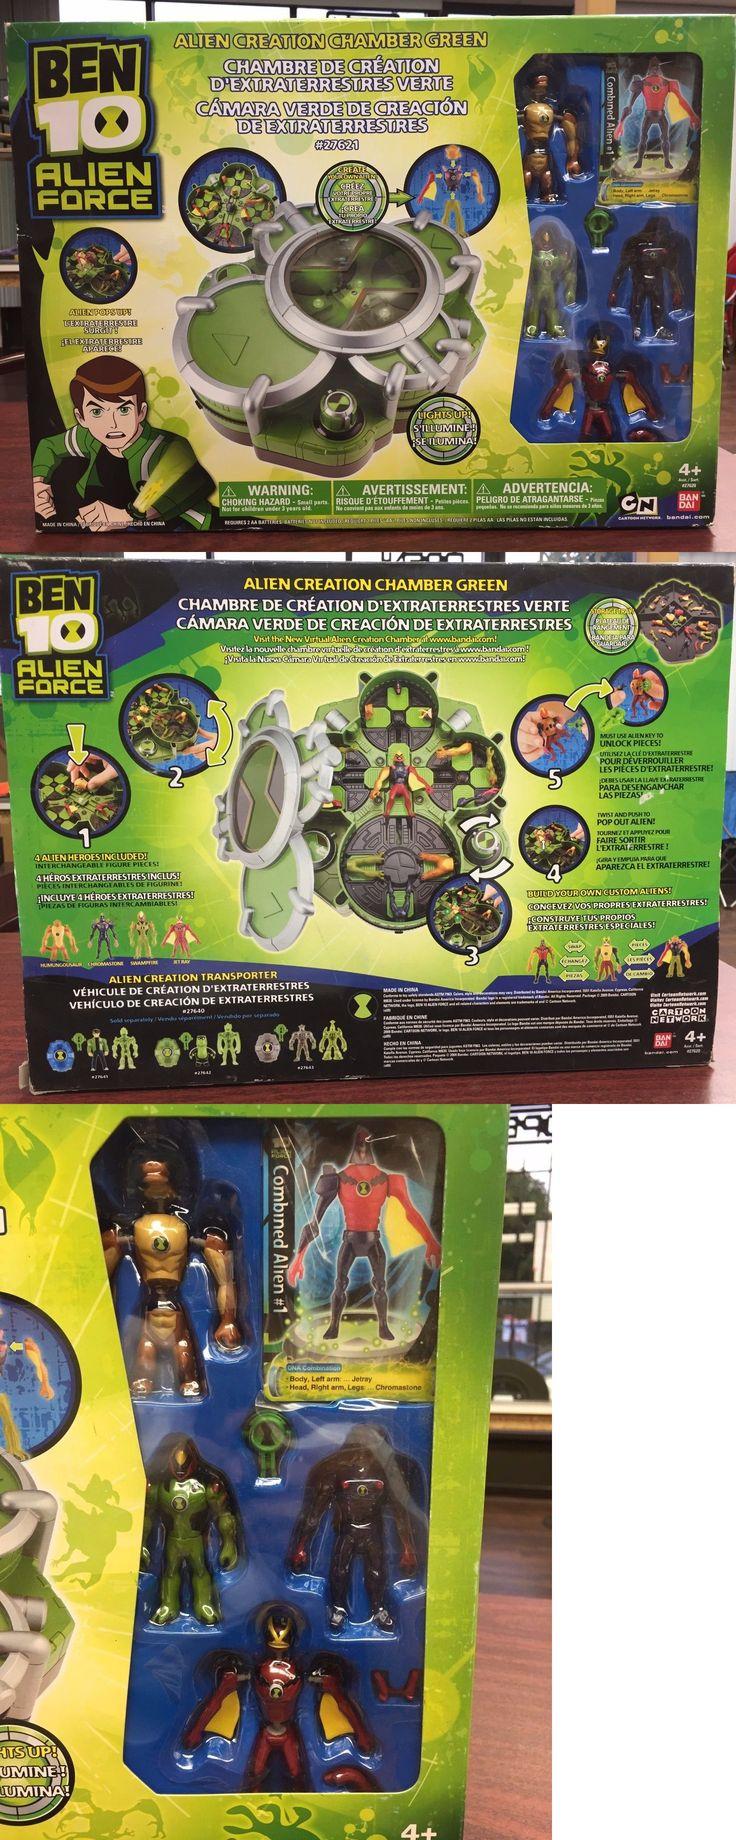 Ben 10 152906: Ben 10 Alien Force Alien Creation Chamber Green New # Bandai Figures -> BUY IT NOW ONLY: $34.99 on eBay!